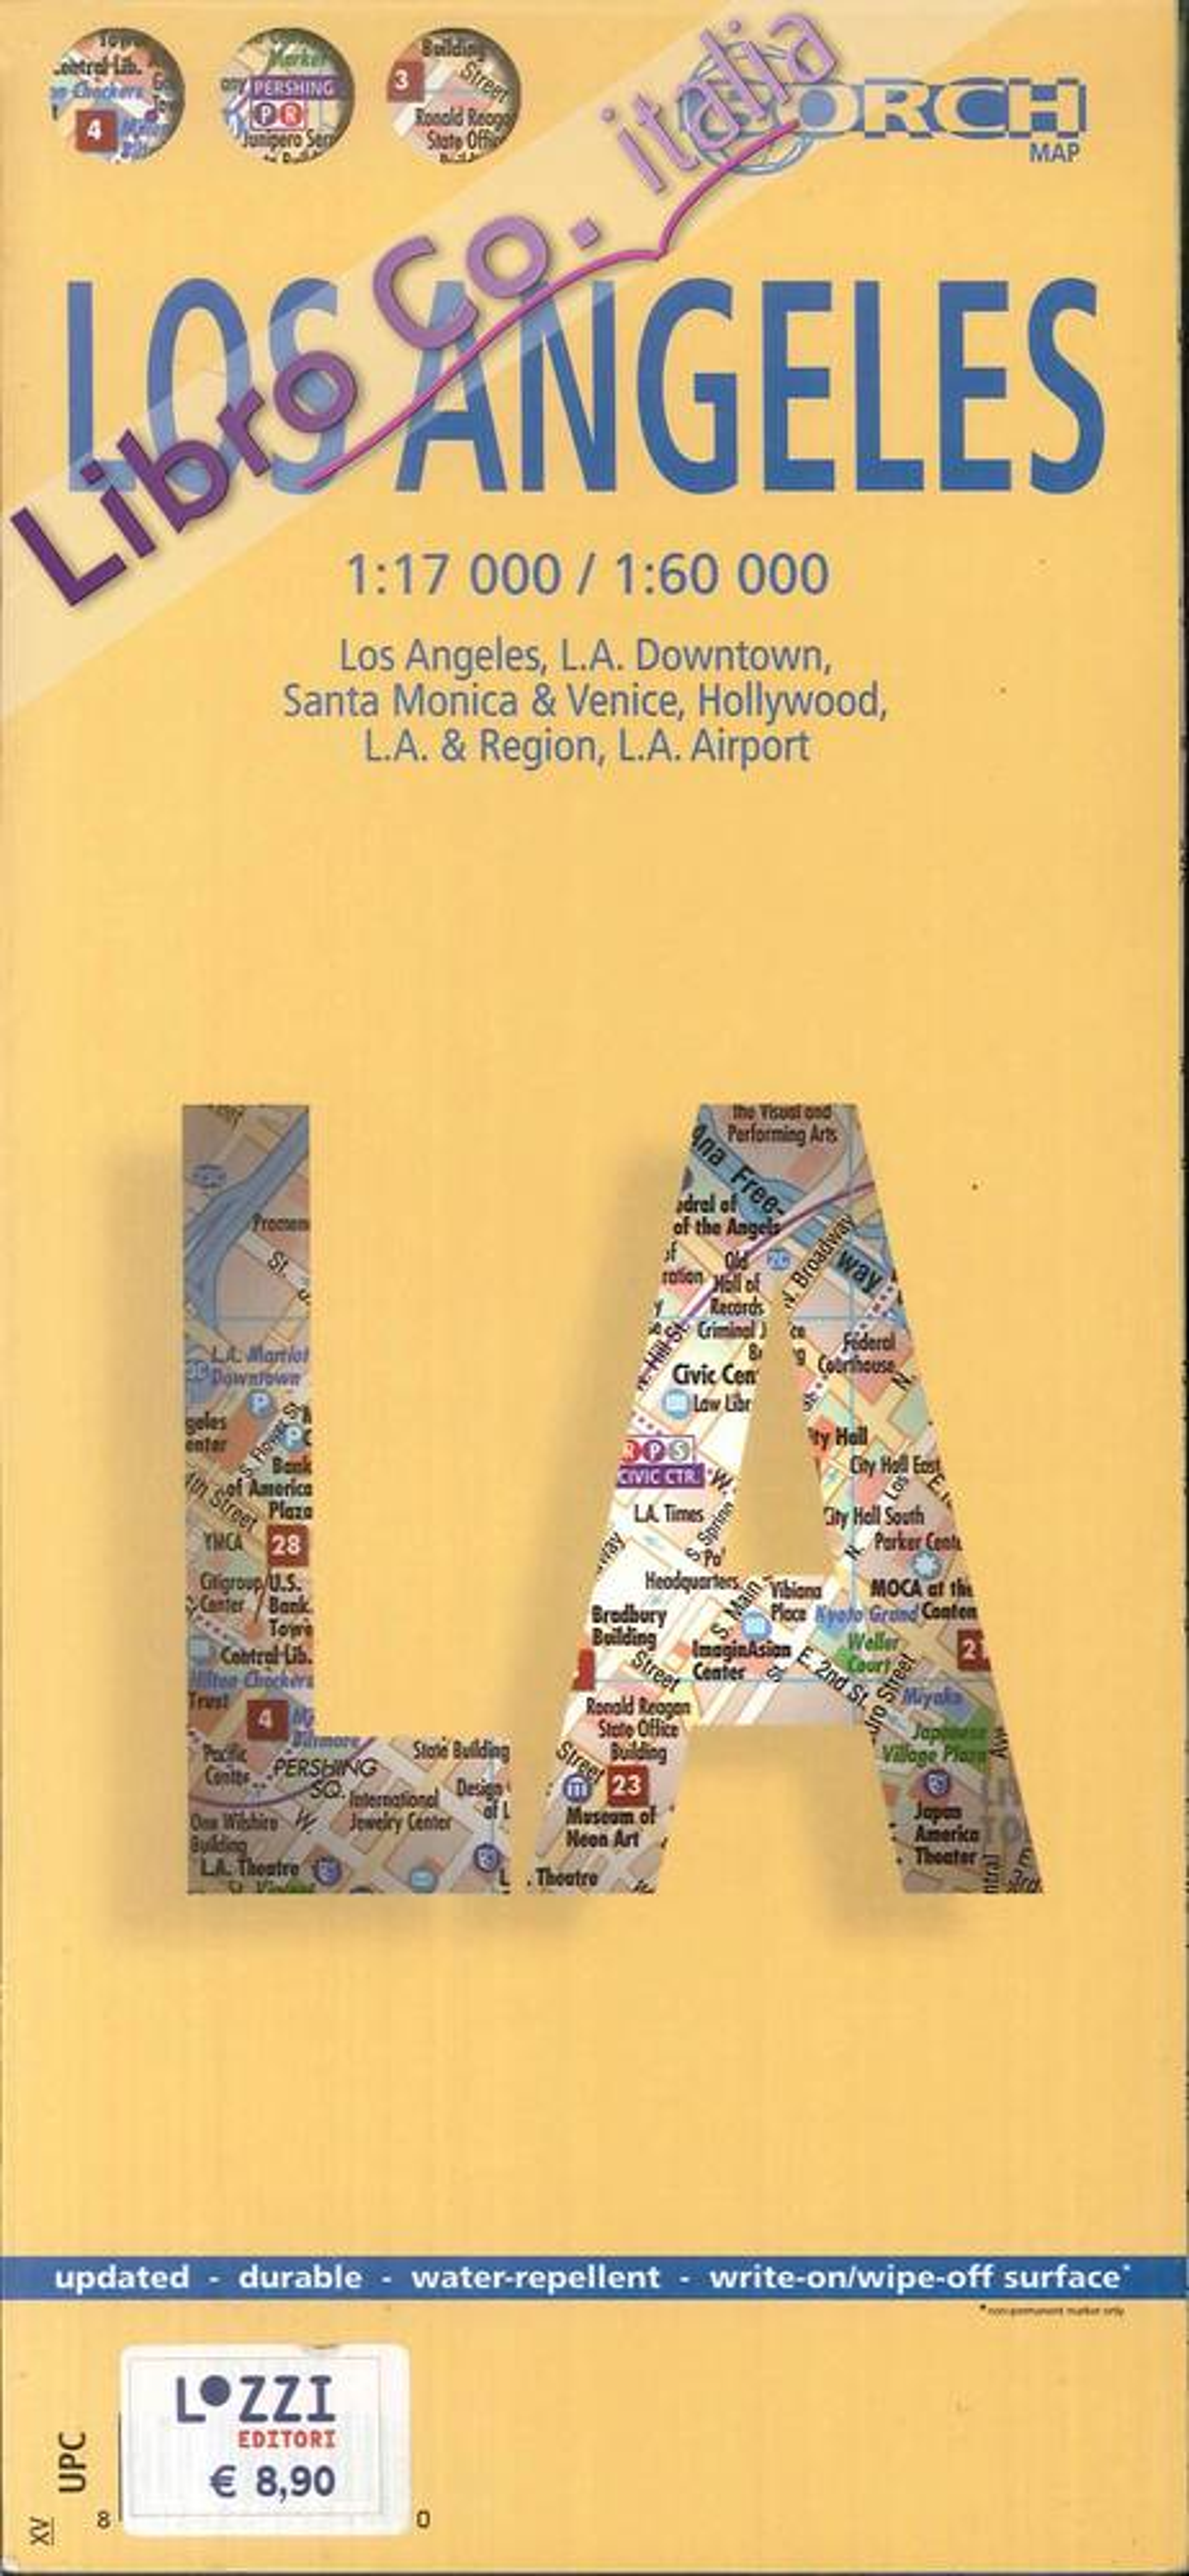 Los Angeles 1:17 000/1:60 000